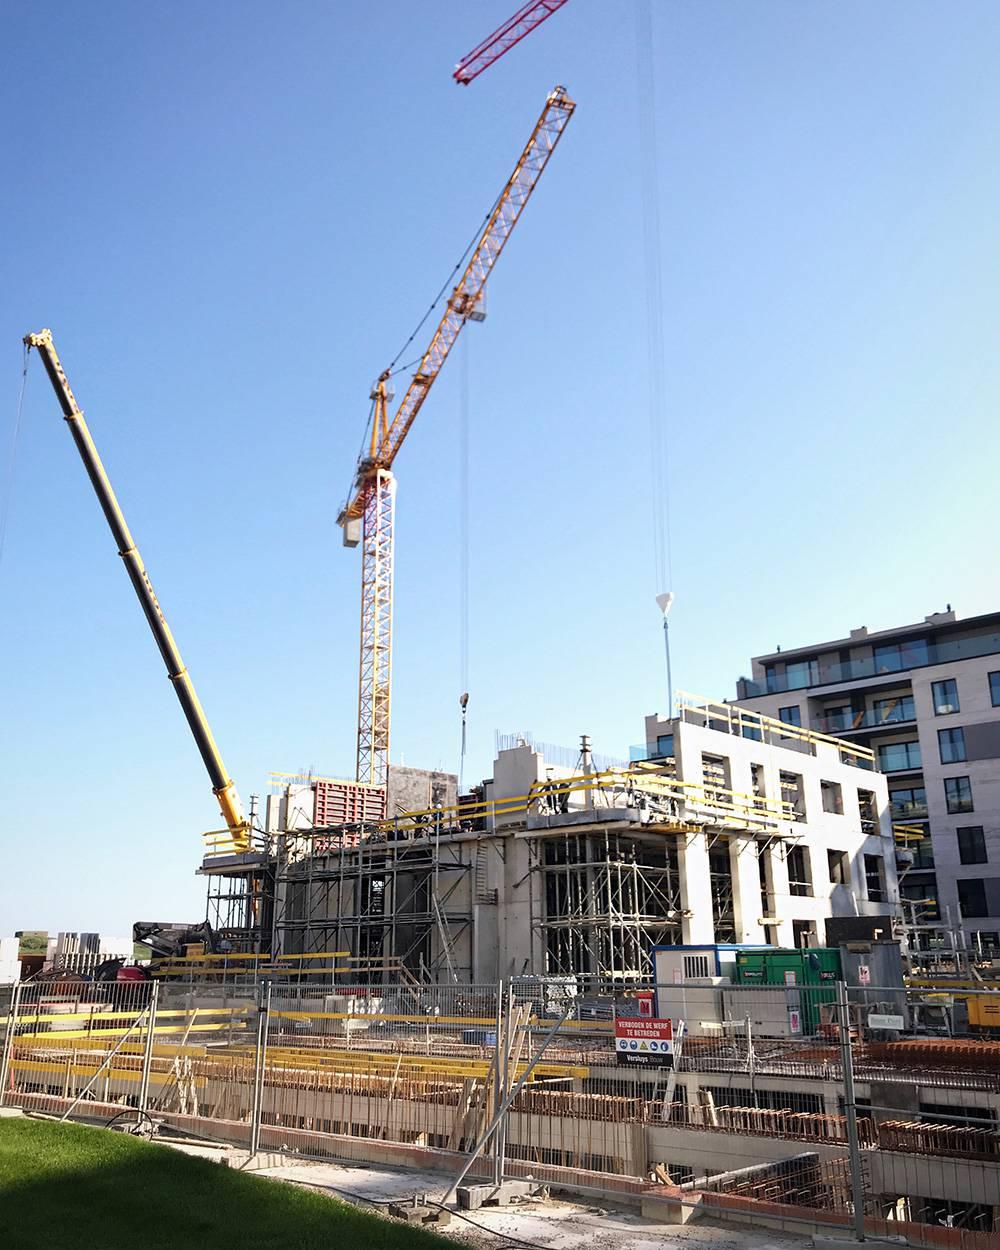 20190516 - Constructie Ensor Tower.jpg